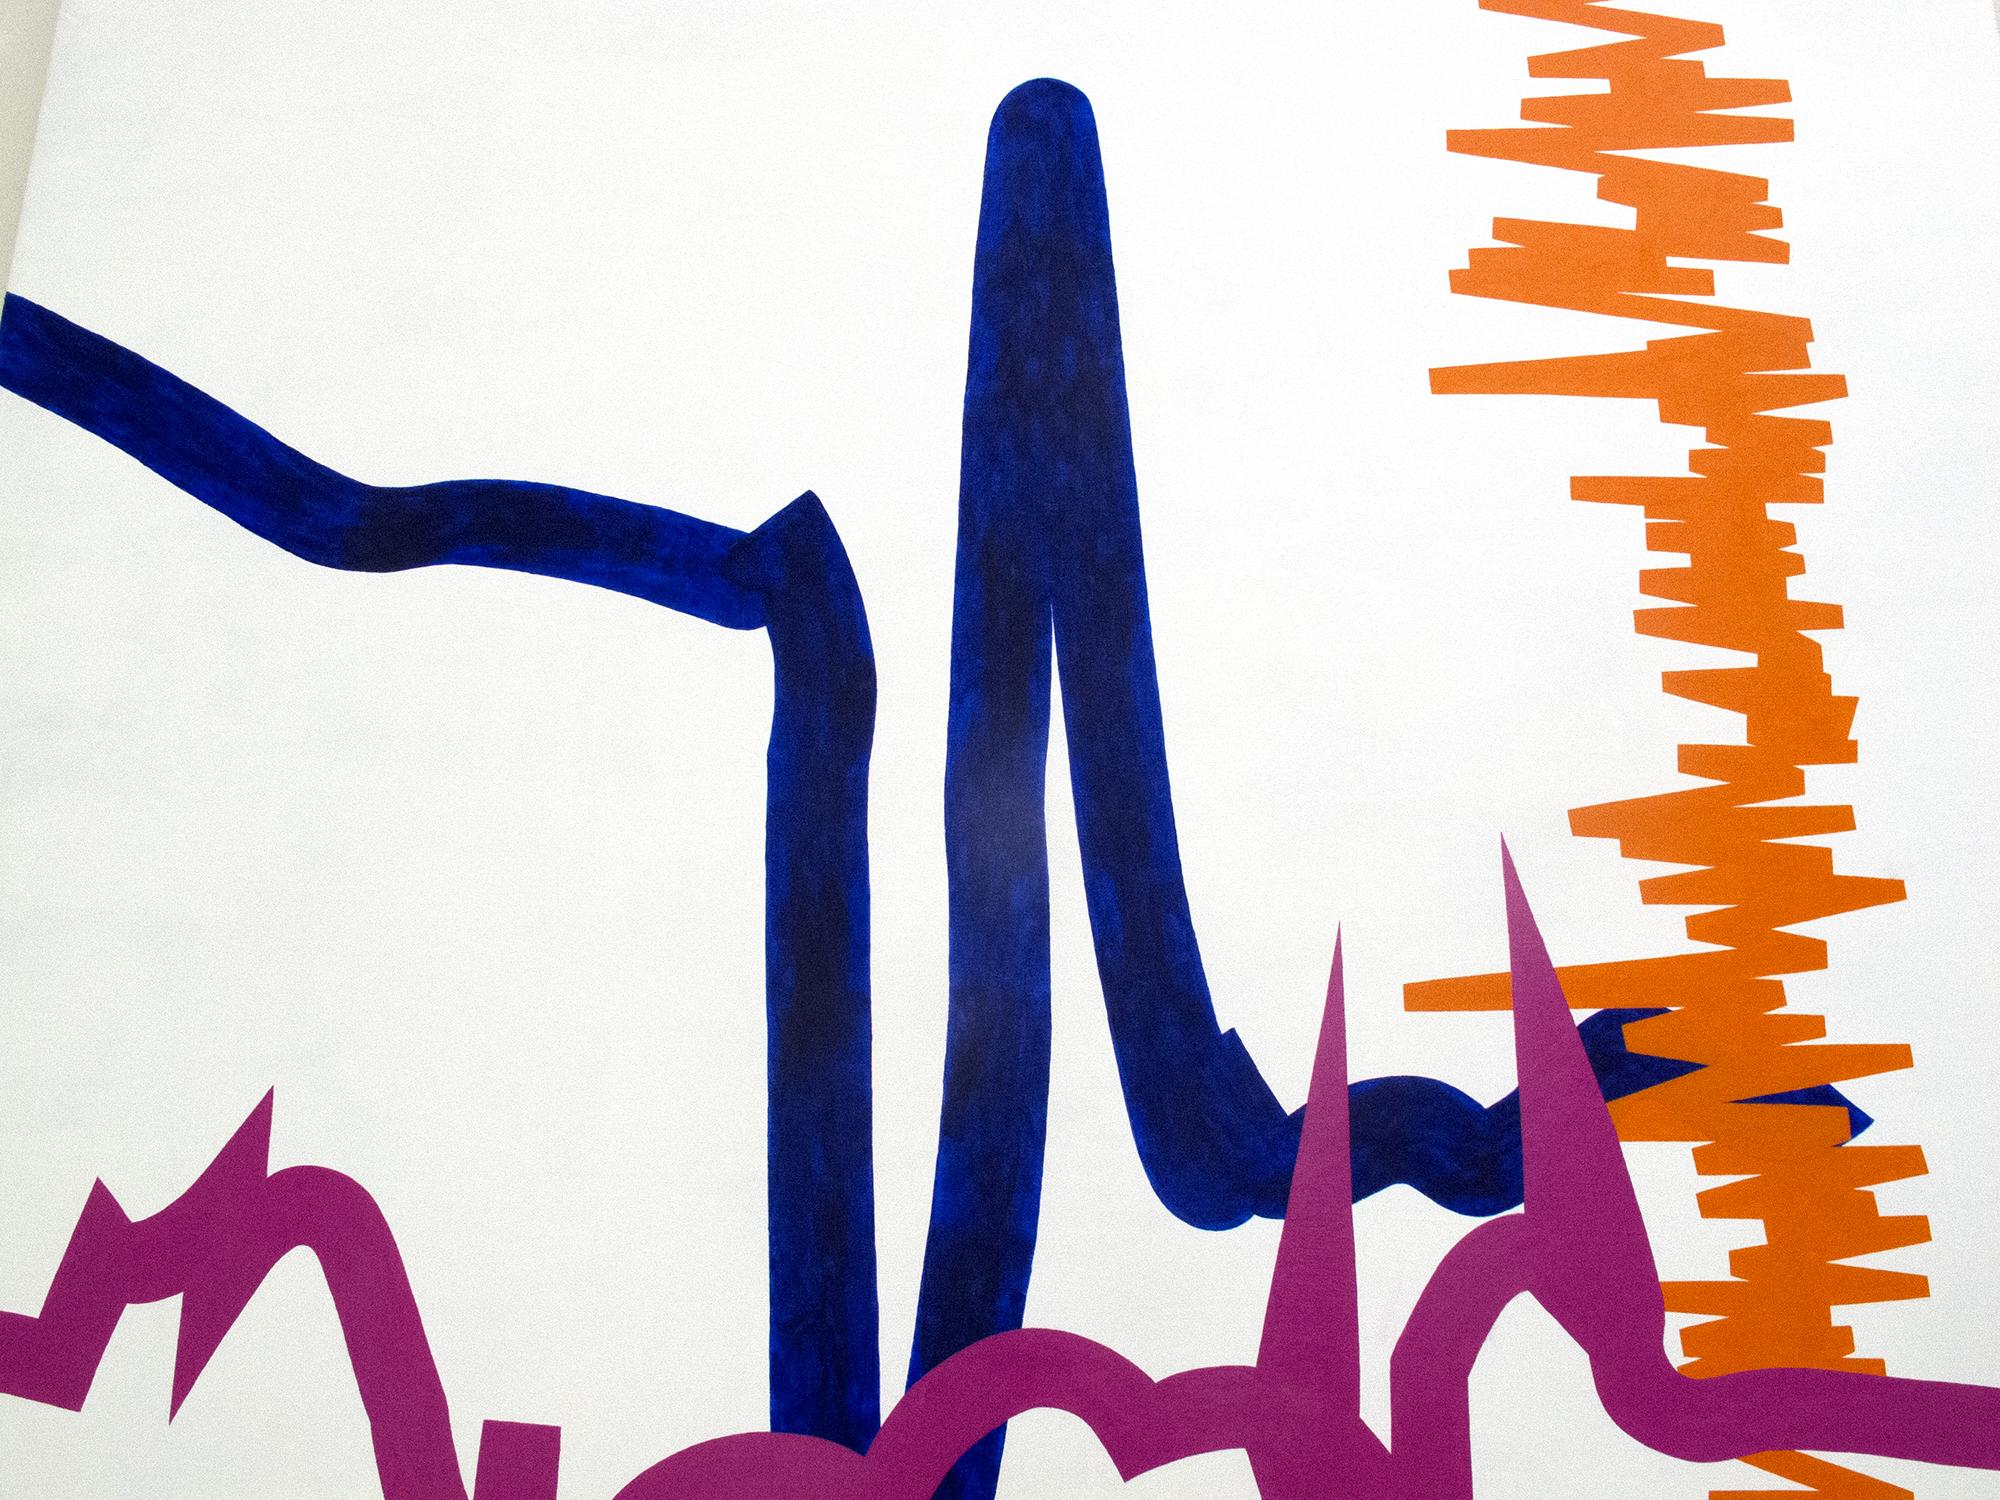 Kristian Sverdrup: Kunstneren som værk